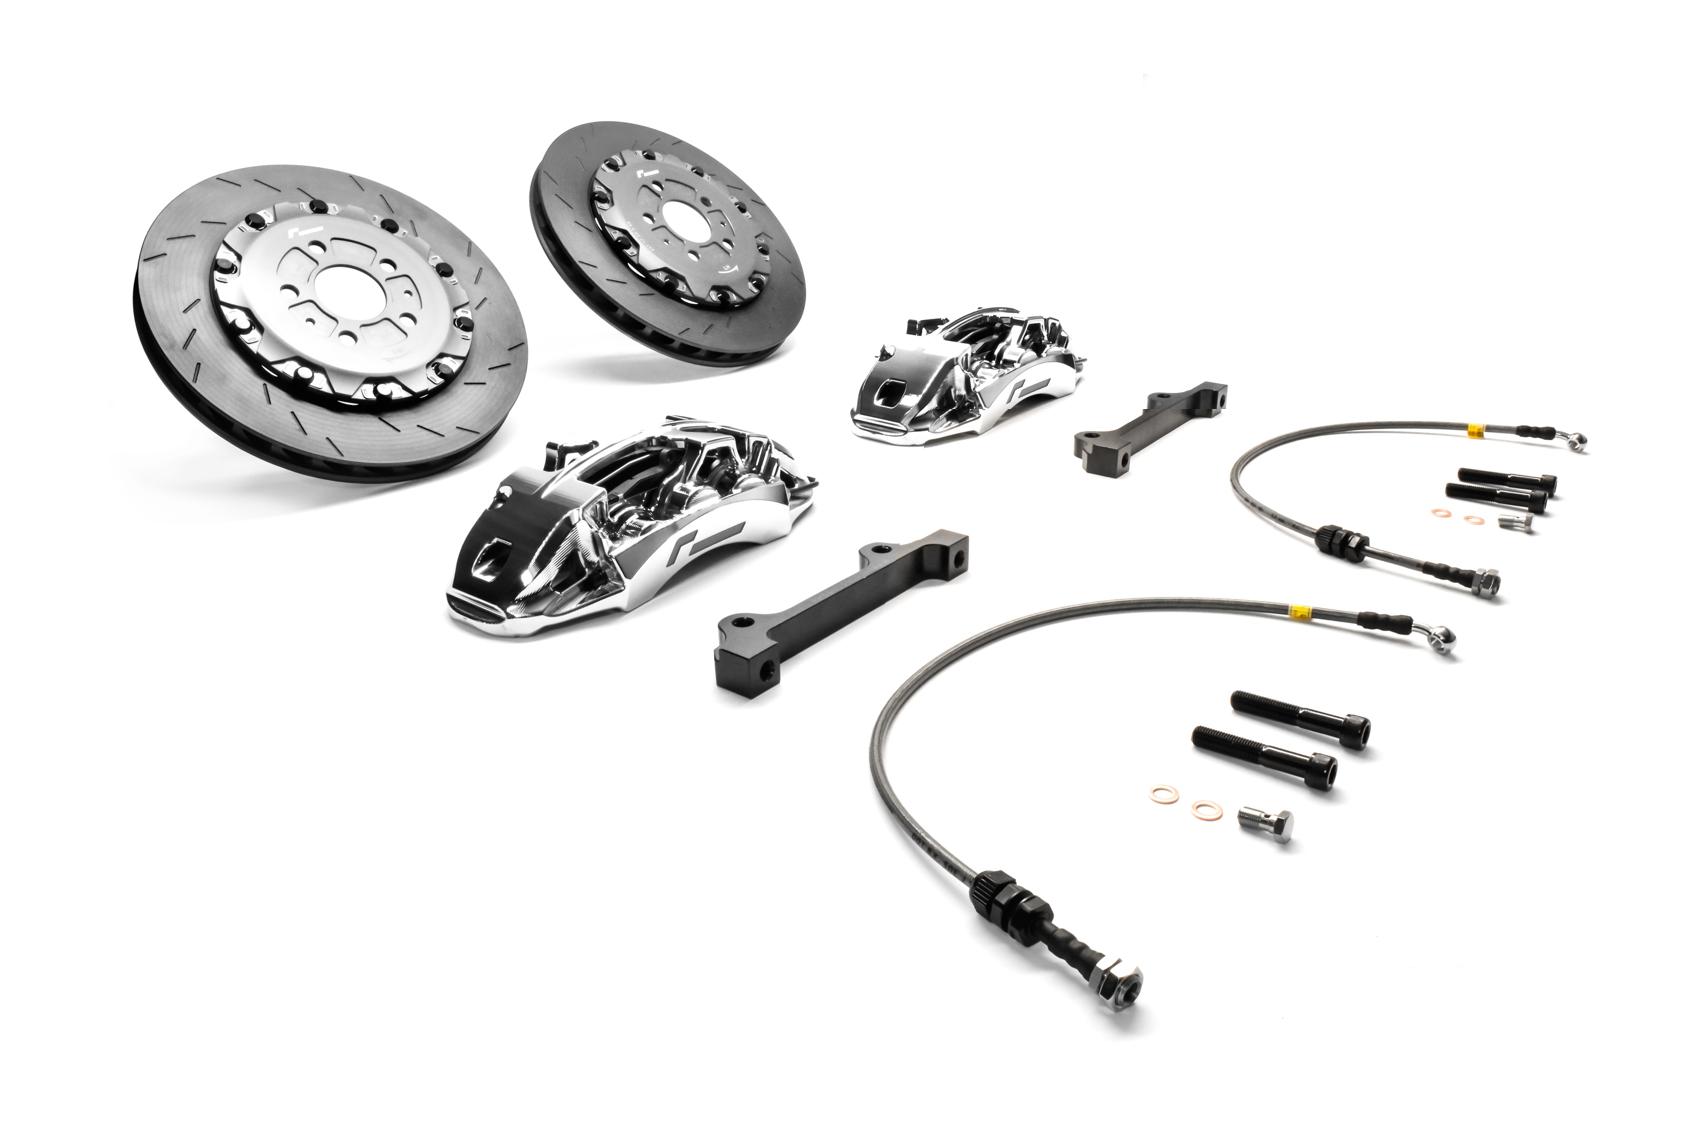 RacingLine Stage 3 Forged Monoblock 355mm Brake Upgrade Kit, Audi/Volkswagen MQB | VWR650001-CHR